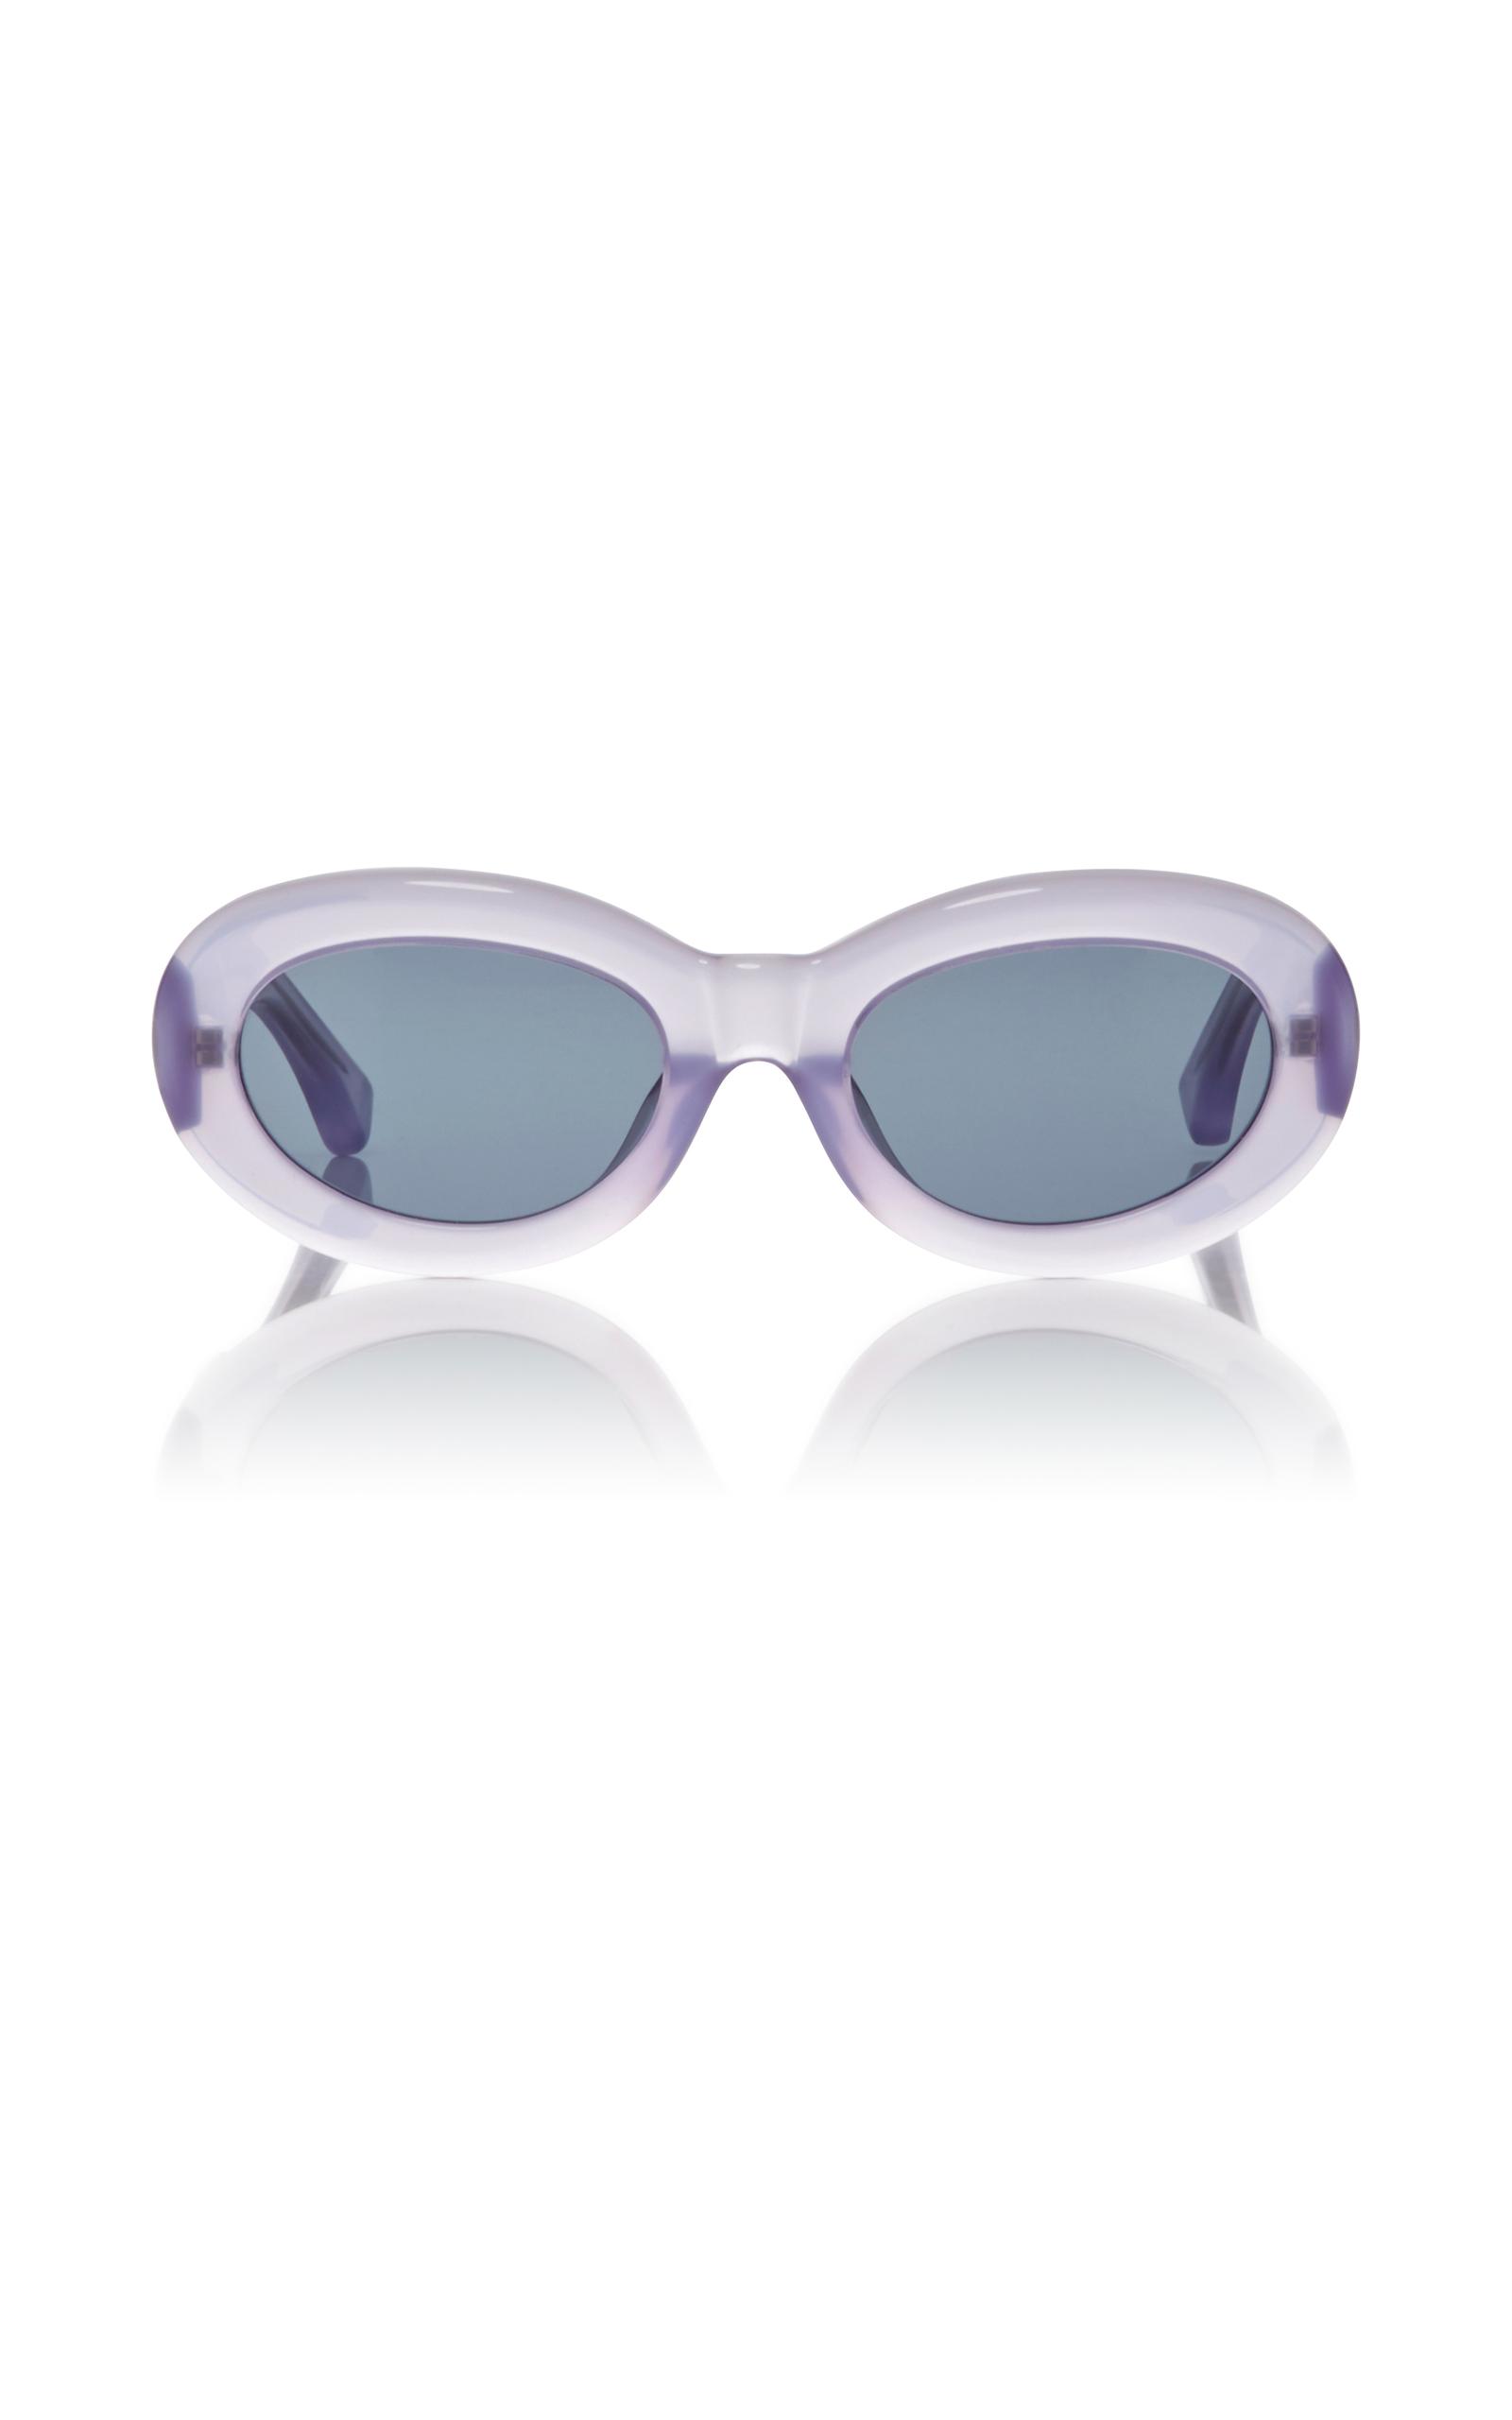 09bccea9e5e Dries Van NotenDries Van Noten Lilac Lucite Sunglasses. CLOSE. Loading